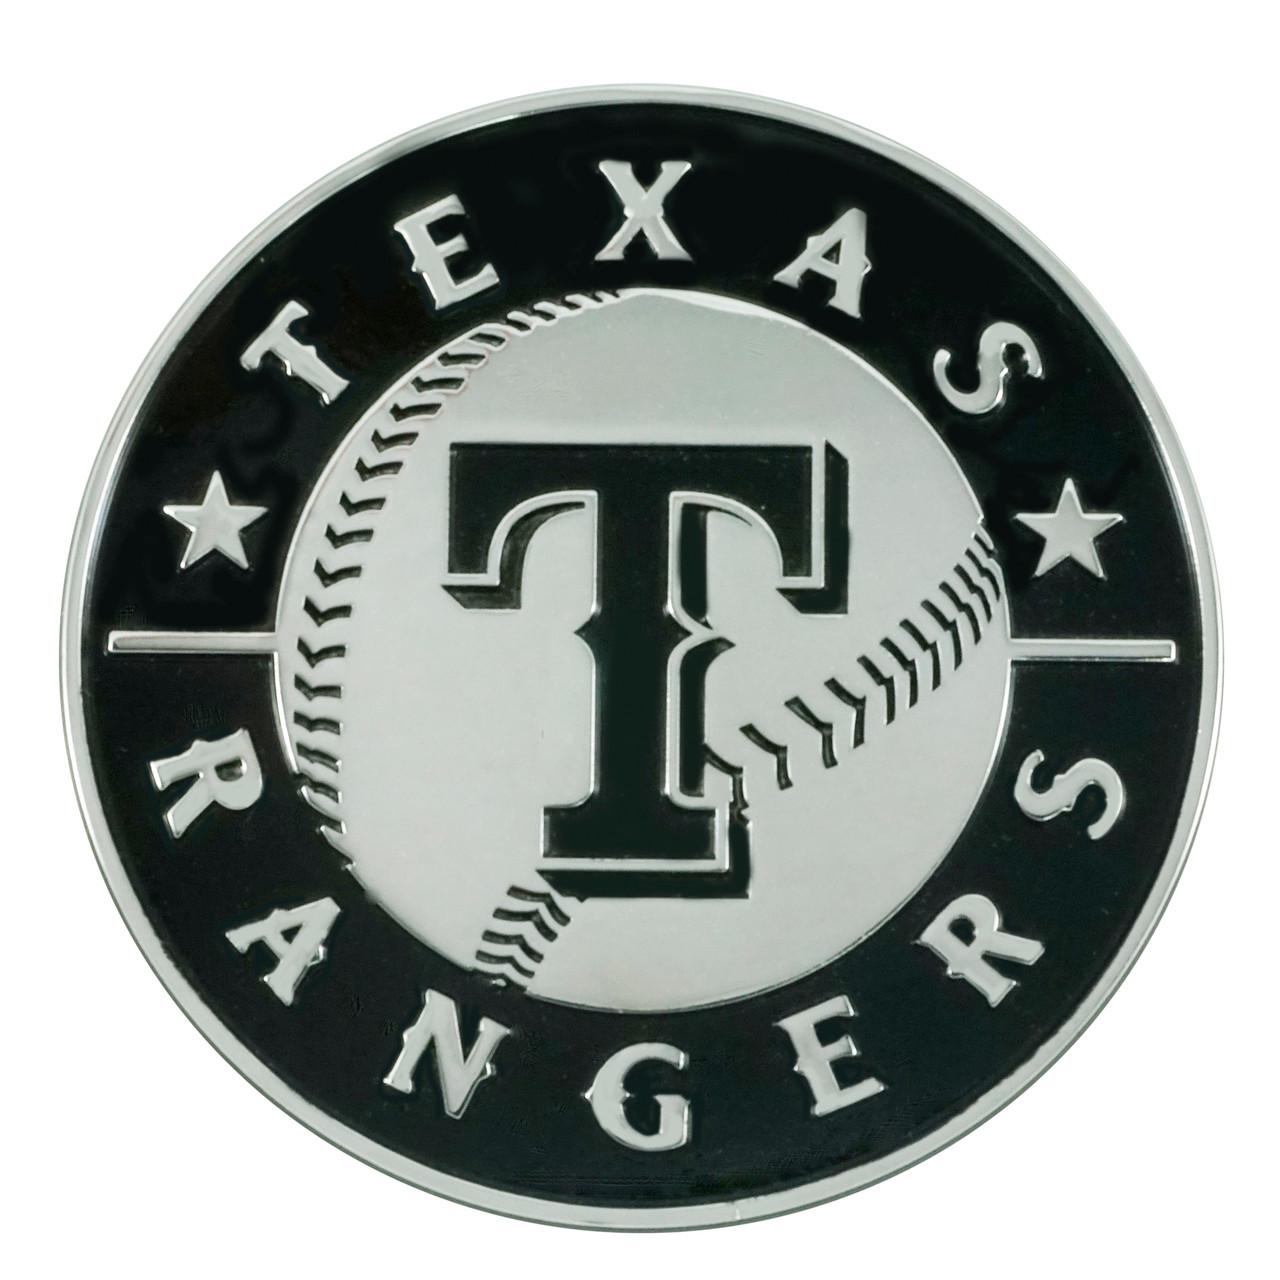 Texas Rangers Auto Emblem Premium Metal Chrome Special Order